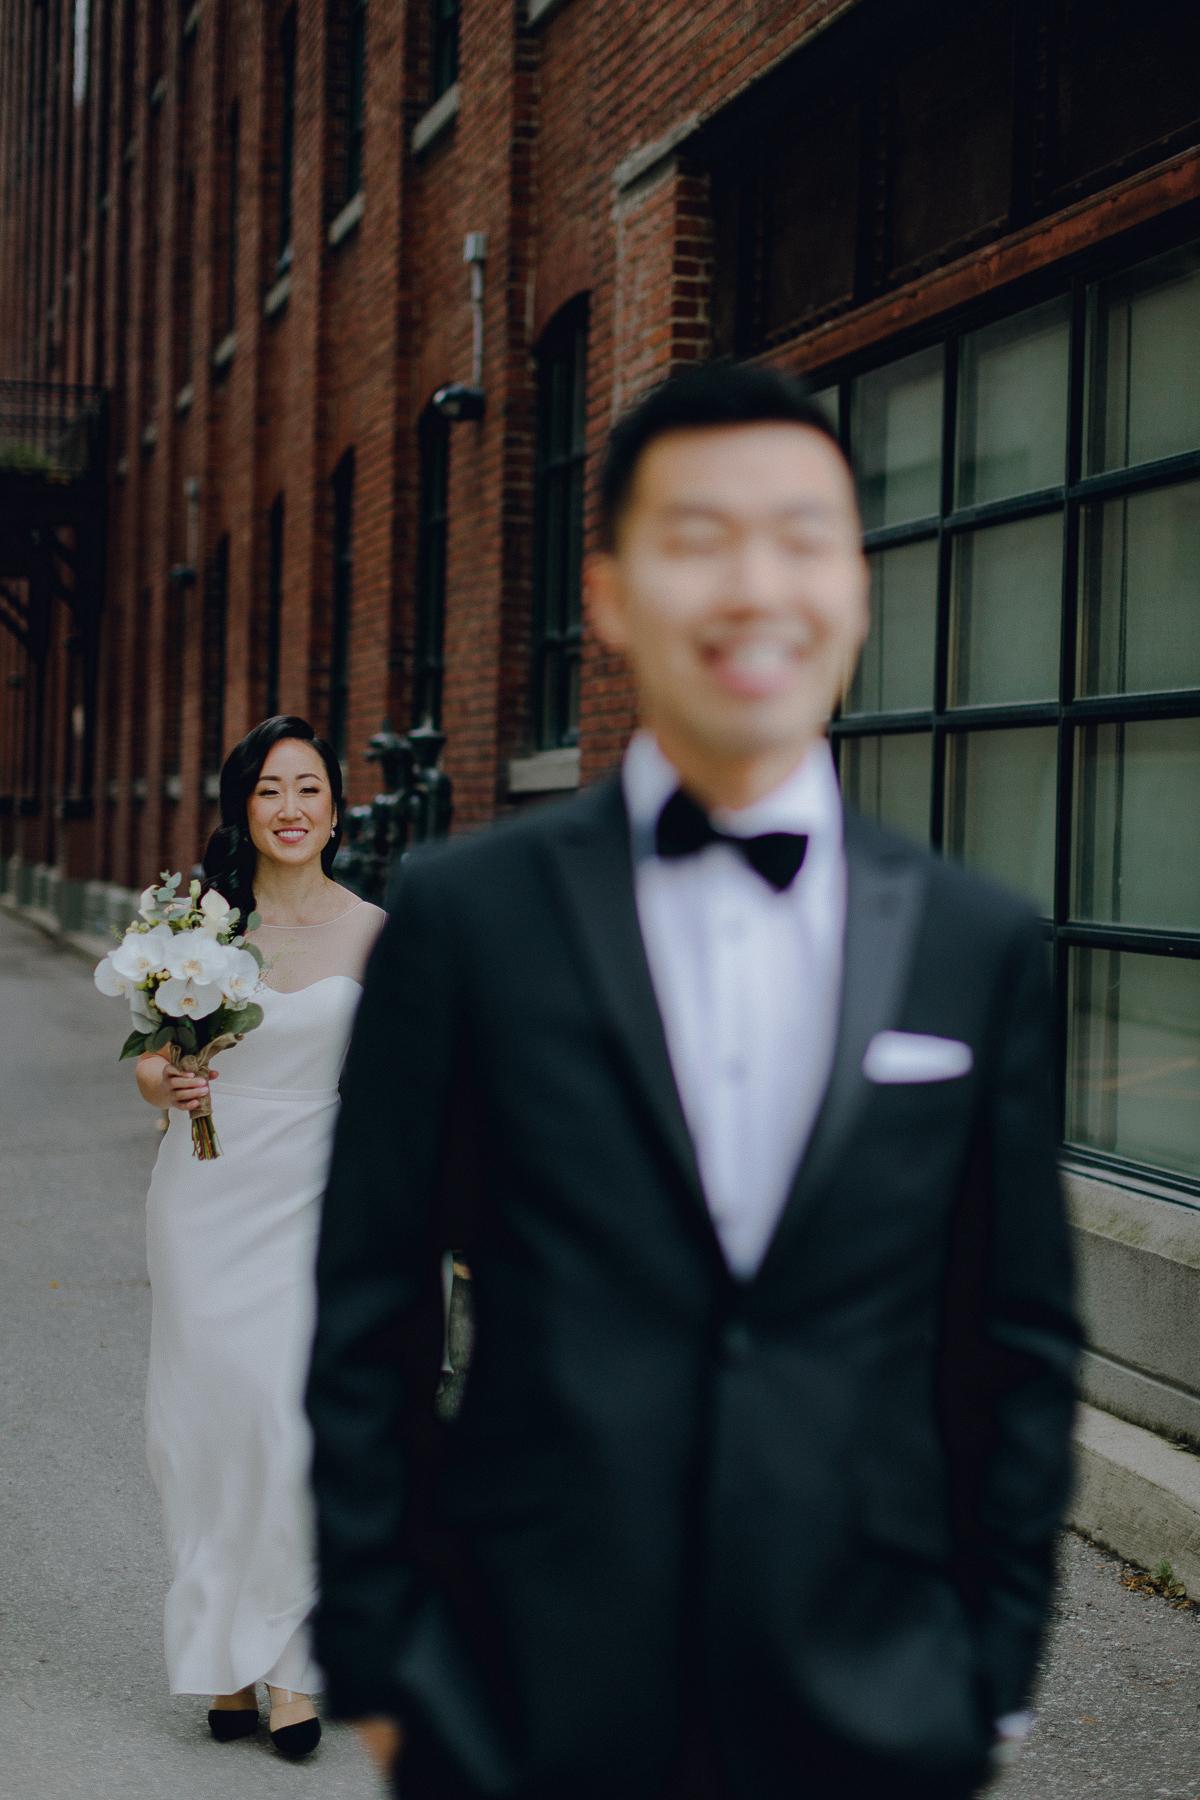 cannoe-restaurannt-wedding 0014.jpg